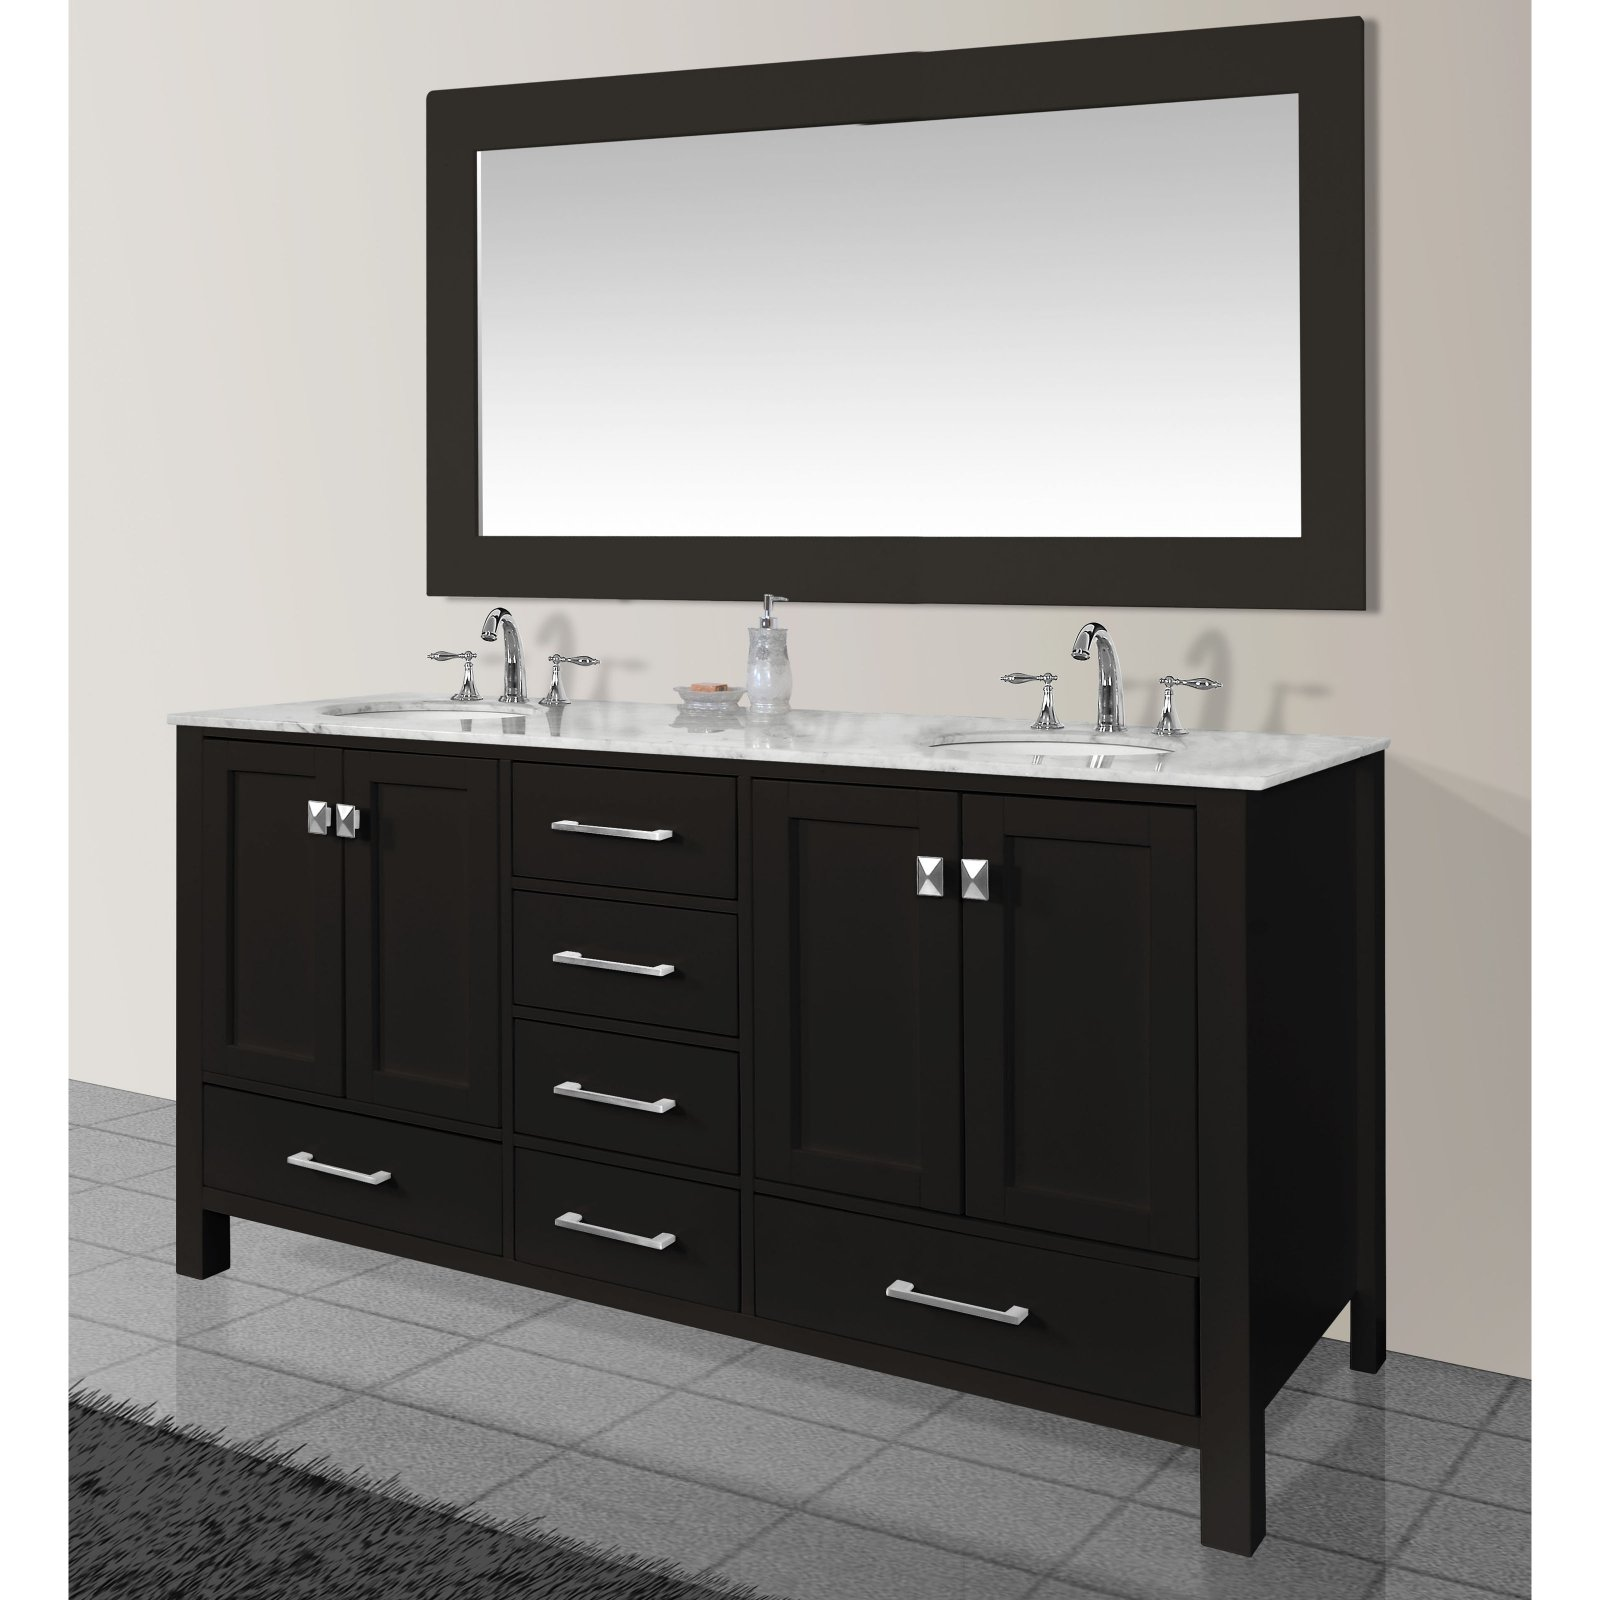 Stufurhome Malibu 72 in. Double Sink Bathroom Vanity - Walmart.com